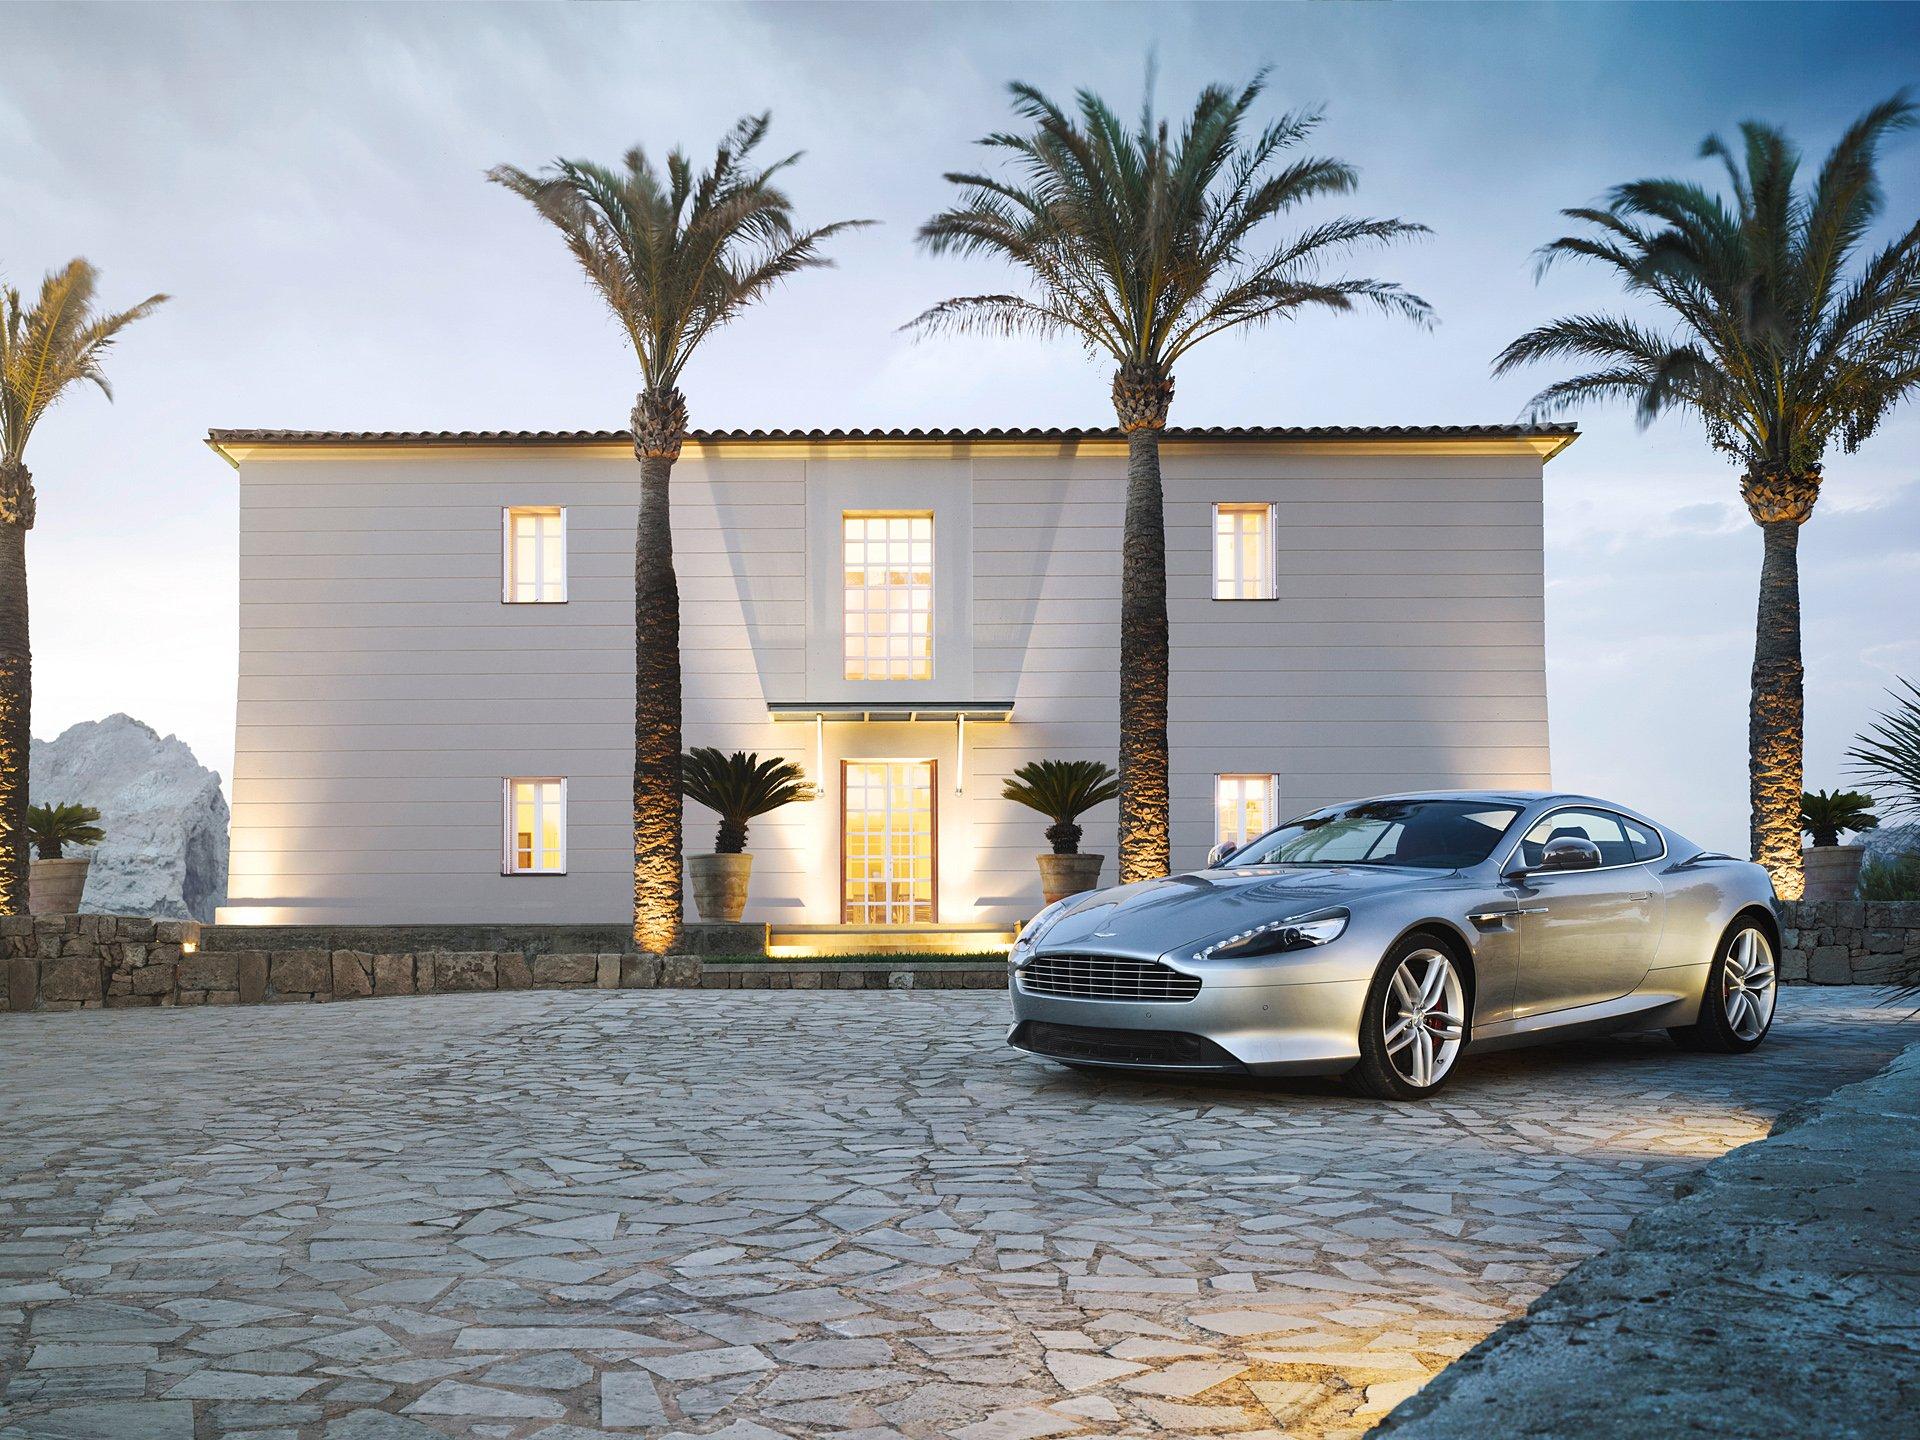 Vehicles - Aston Martin DB9  Aston Martin Wallpaper